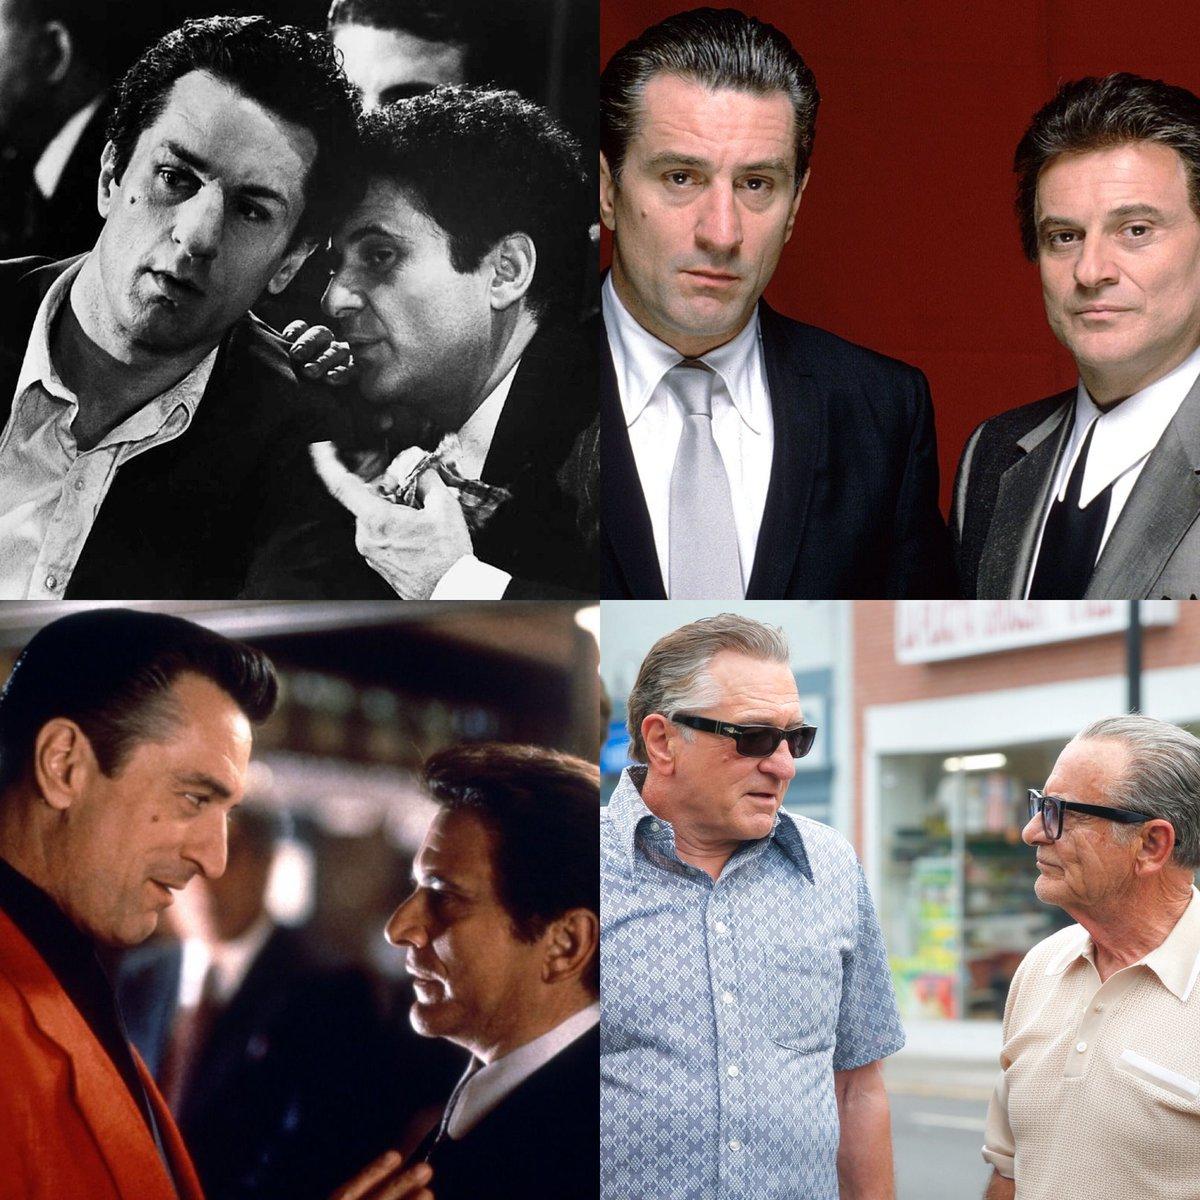 Robert de Niro  Joe Pesci  Raging Bull (1980) Goodfellas (1990) Casino (1995) The Irishman (2019) <br>http://pic.twitter.com/QU8AbqMbxU